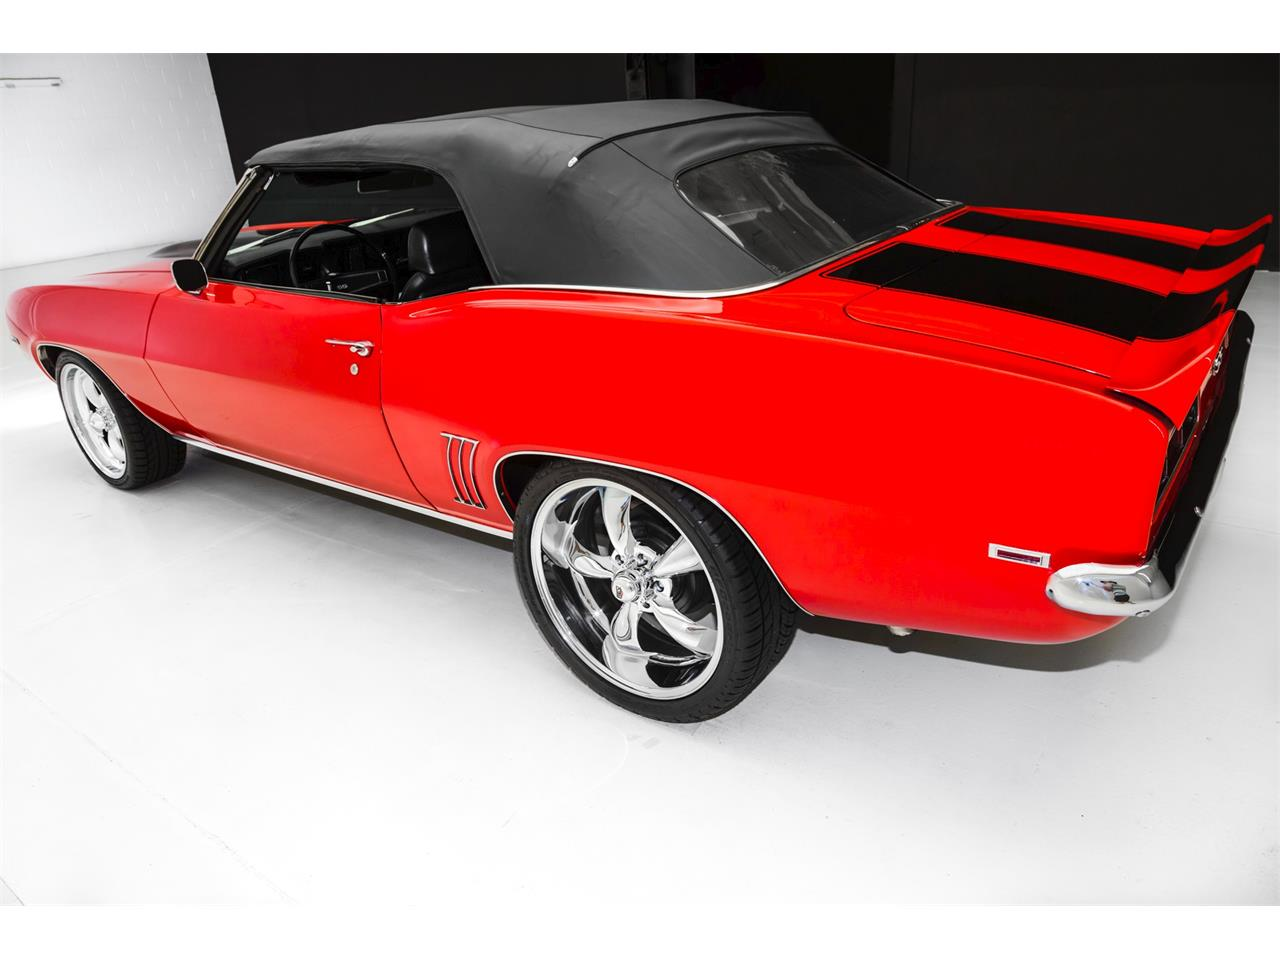 Large Picture of Classic '69 Chevrolet Camaro located in Des Moines Iowa - LQPC